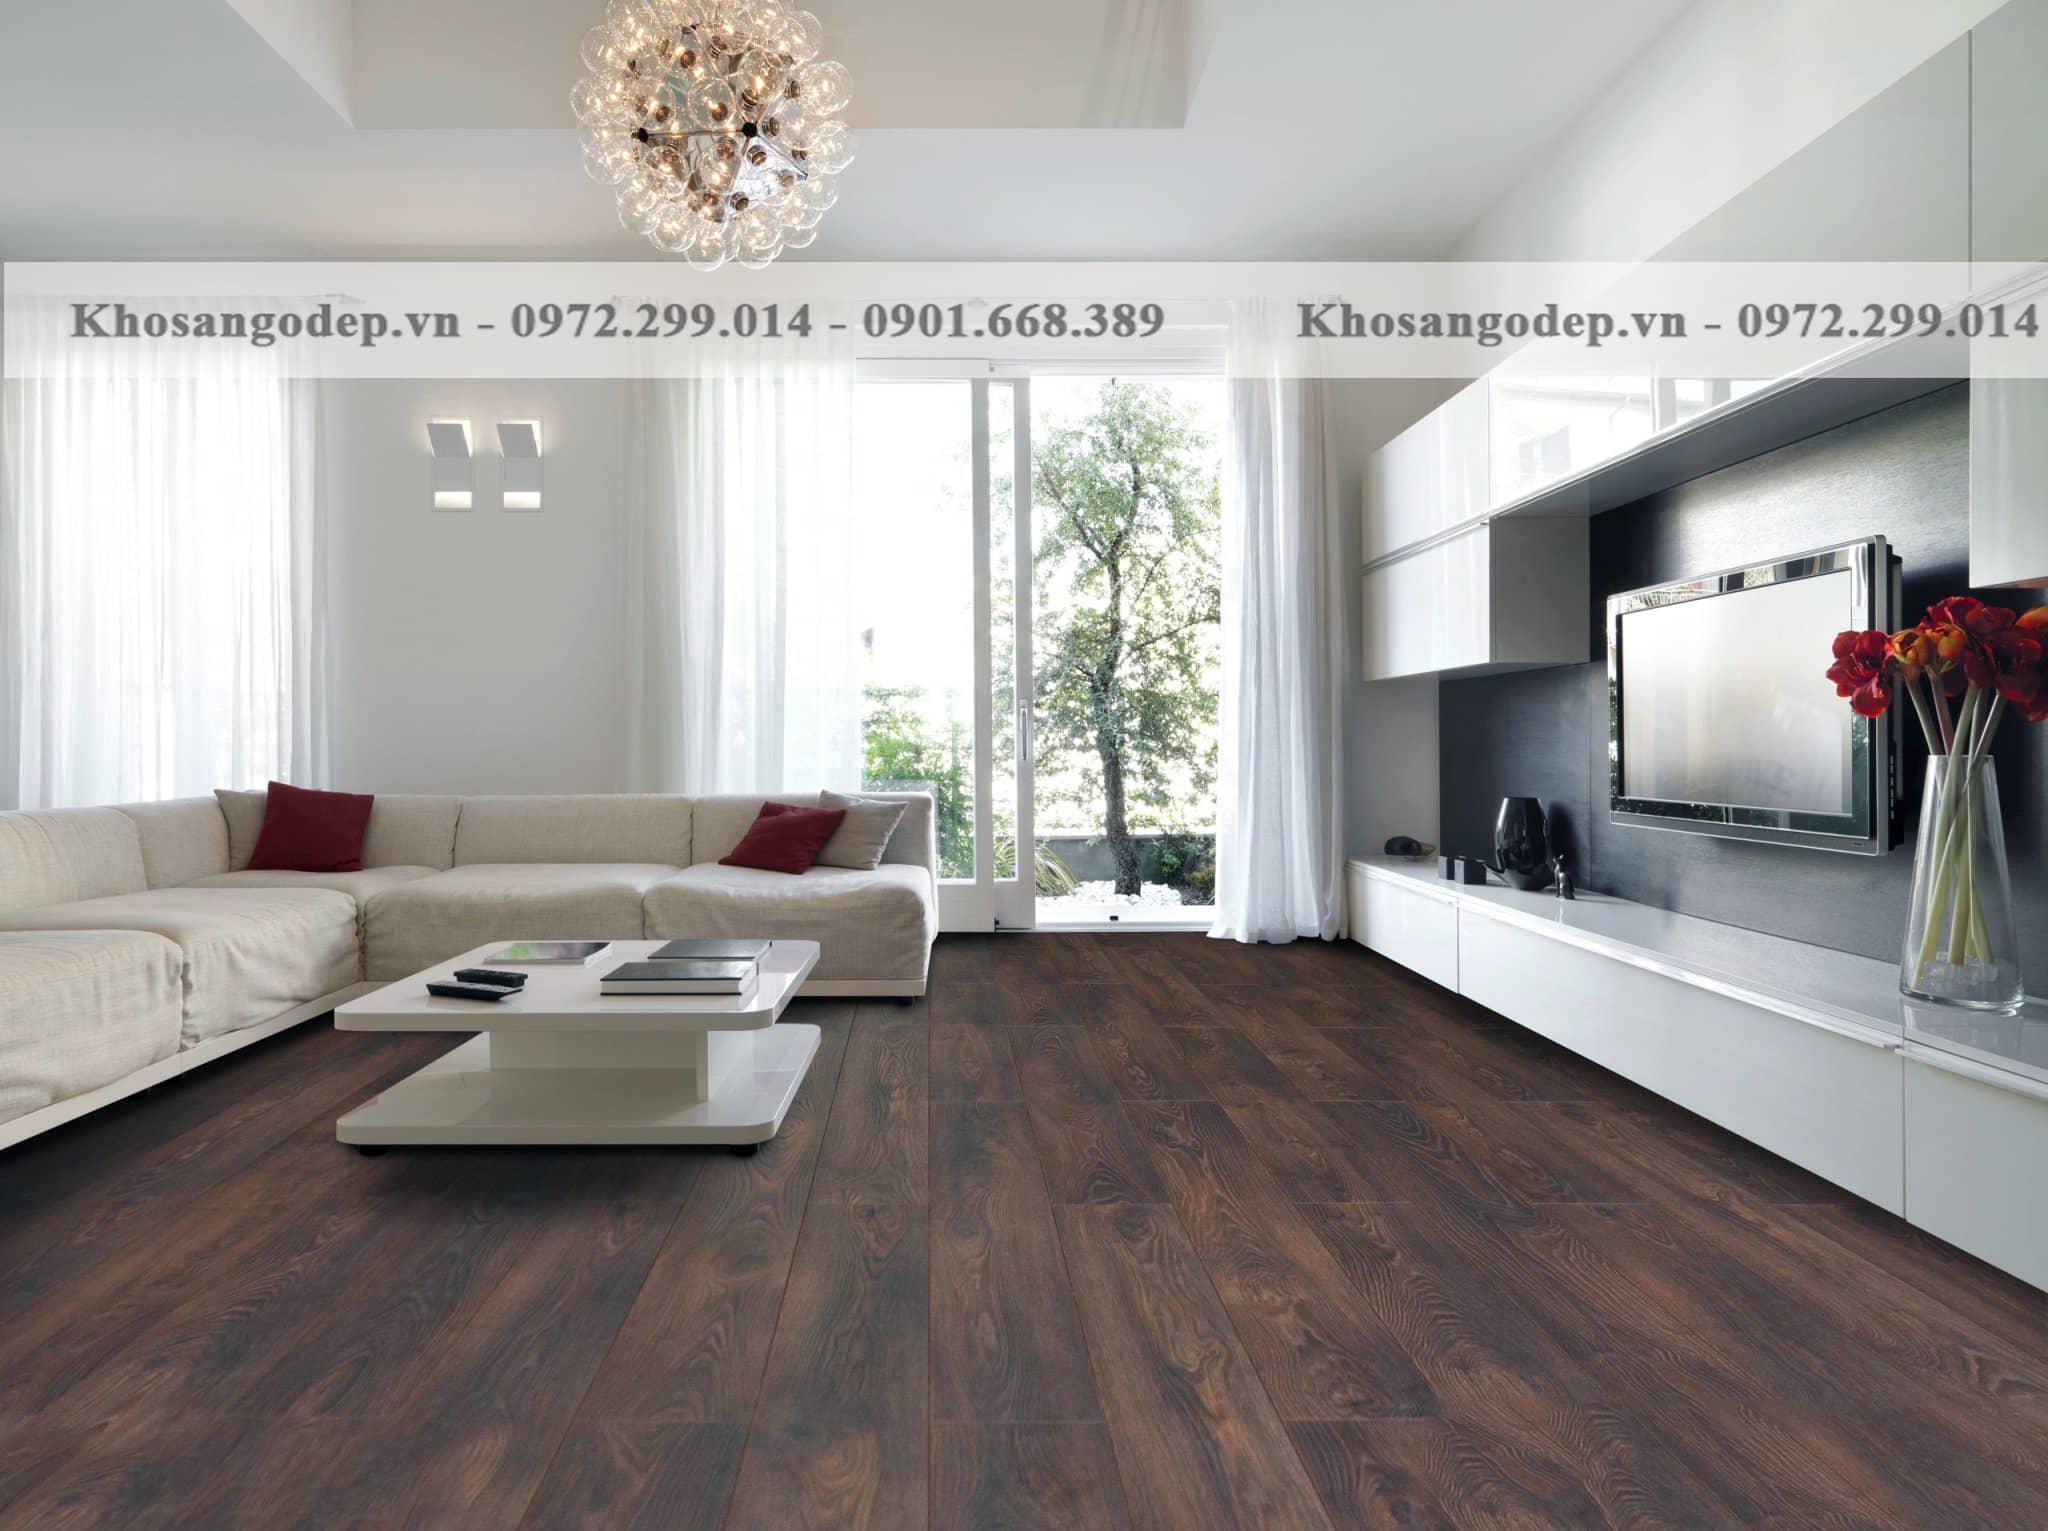 Sàn gỗ Savi quảng ninh